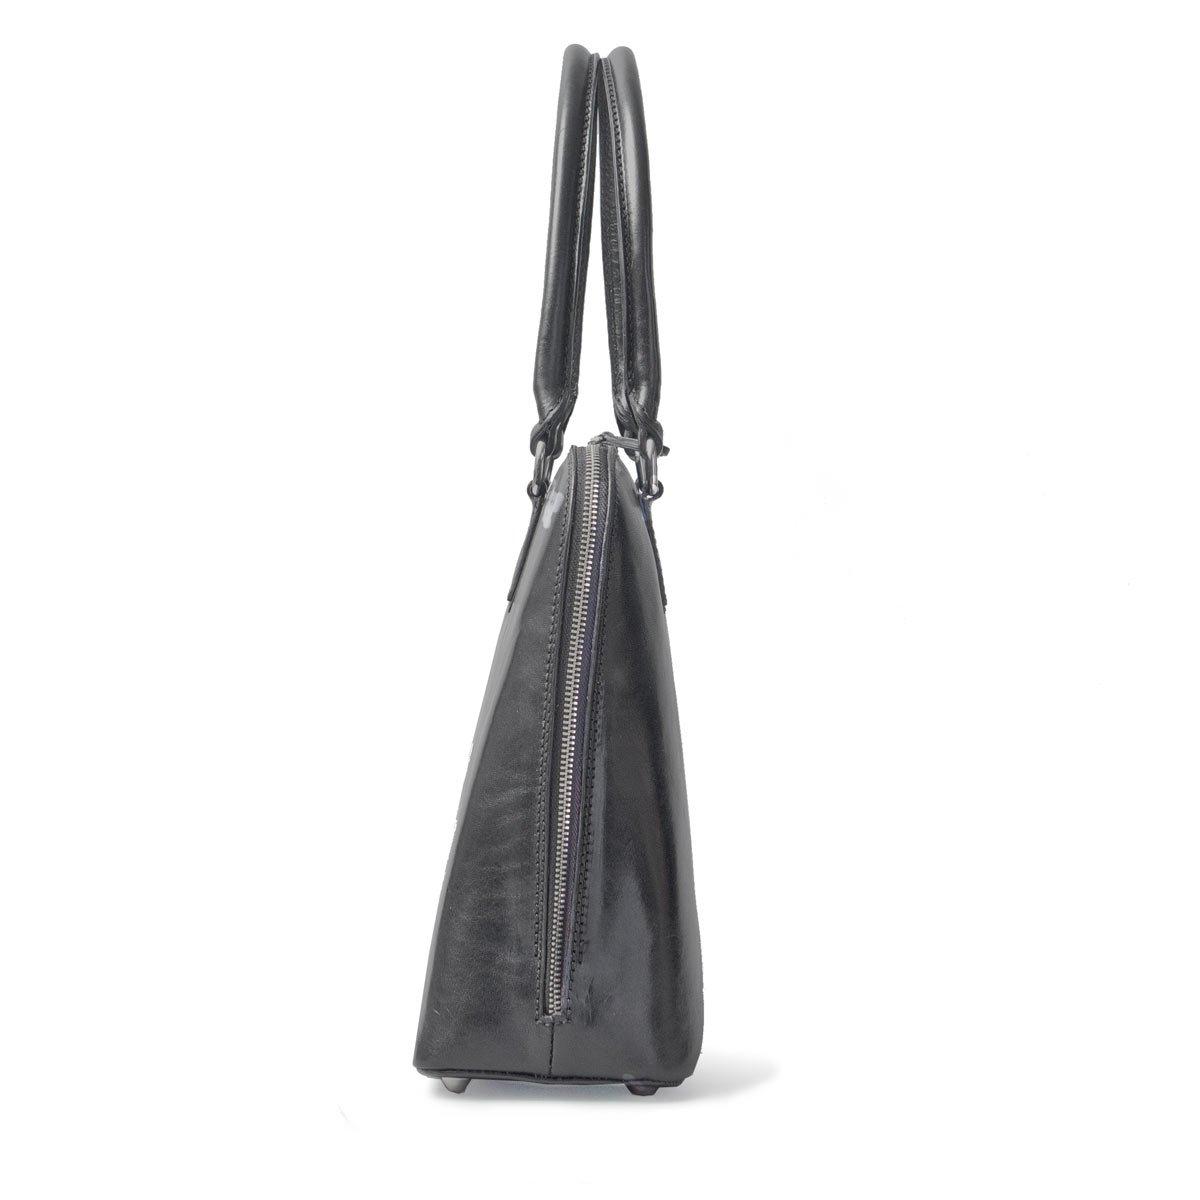 Maxwell Scott Luxury Ladies Black Leather Work Bag Purse for Macbook (Fiorella) by Maxwell Scott Bags (Image #4)